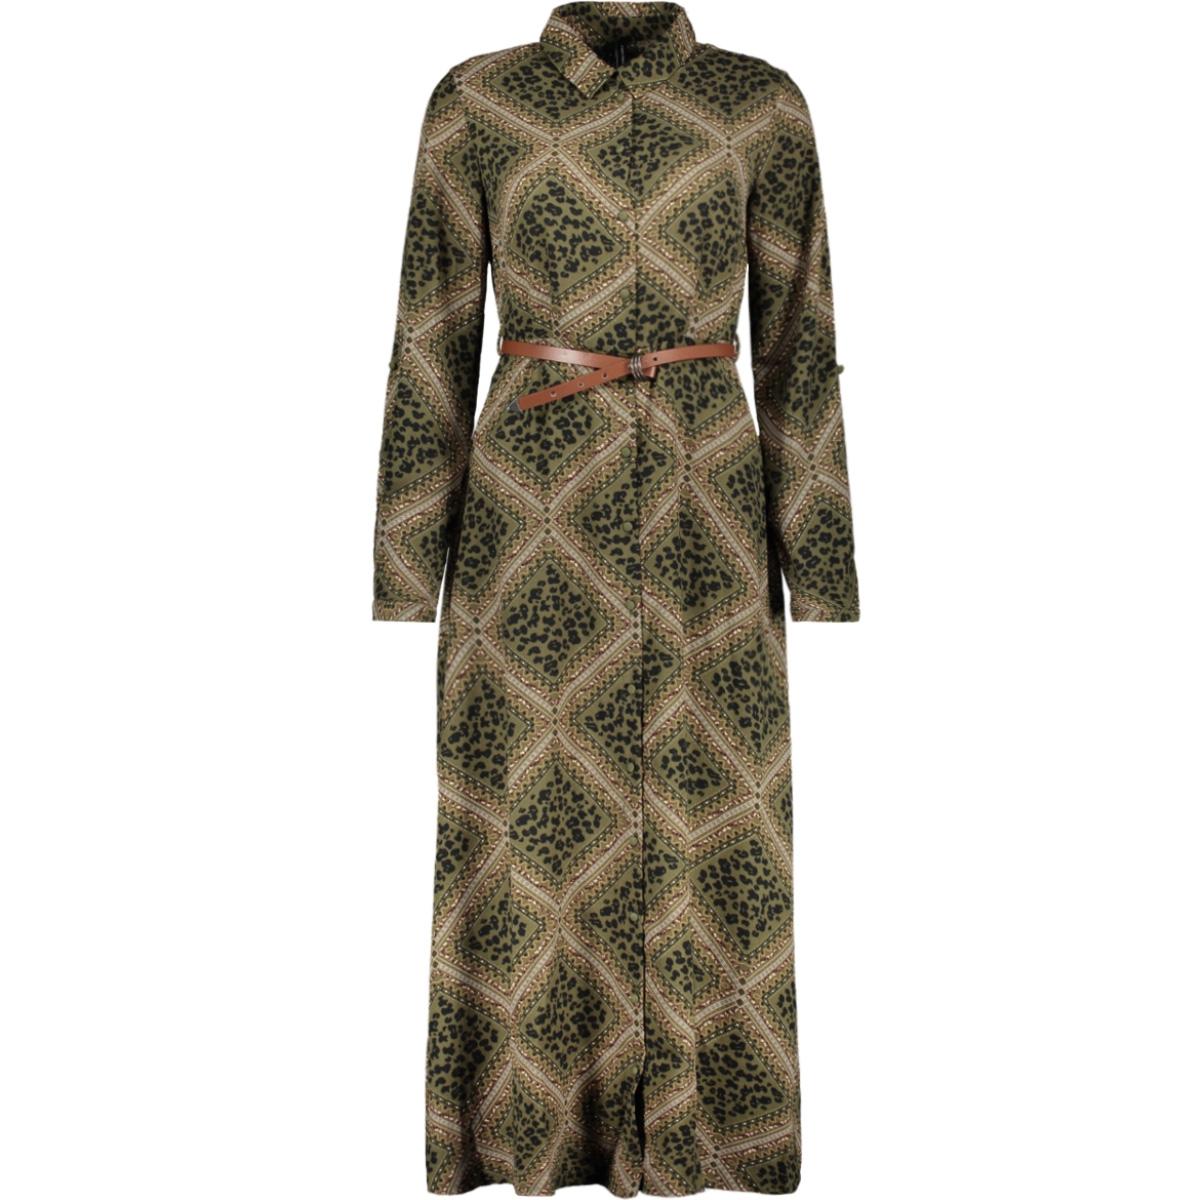 vmnaya l/s maxi shirt dress exp 10228776 vero moda jurk ivy green/graphic